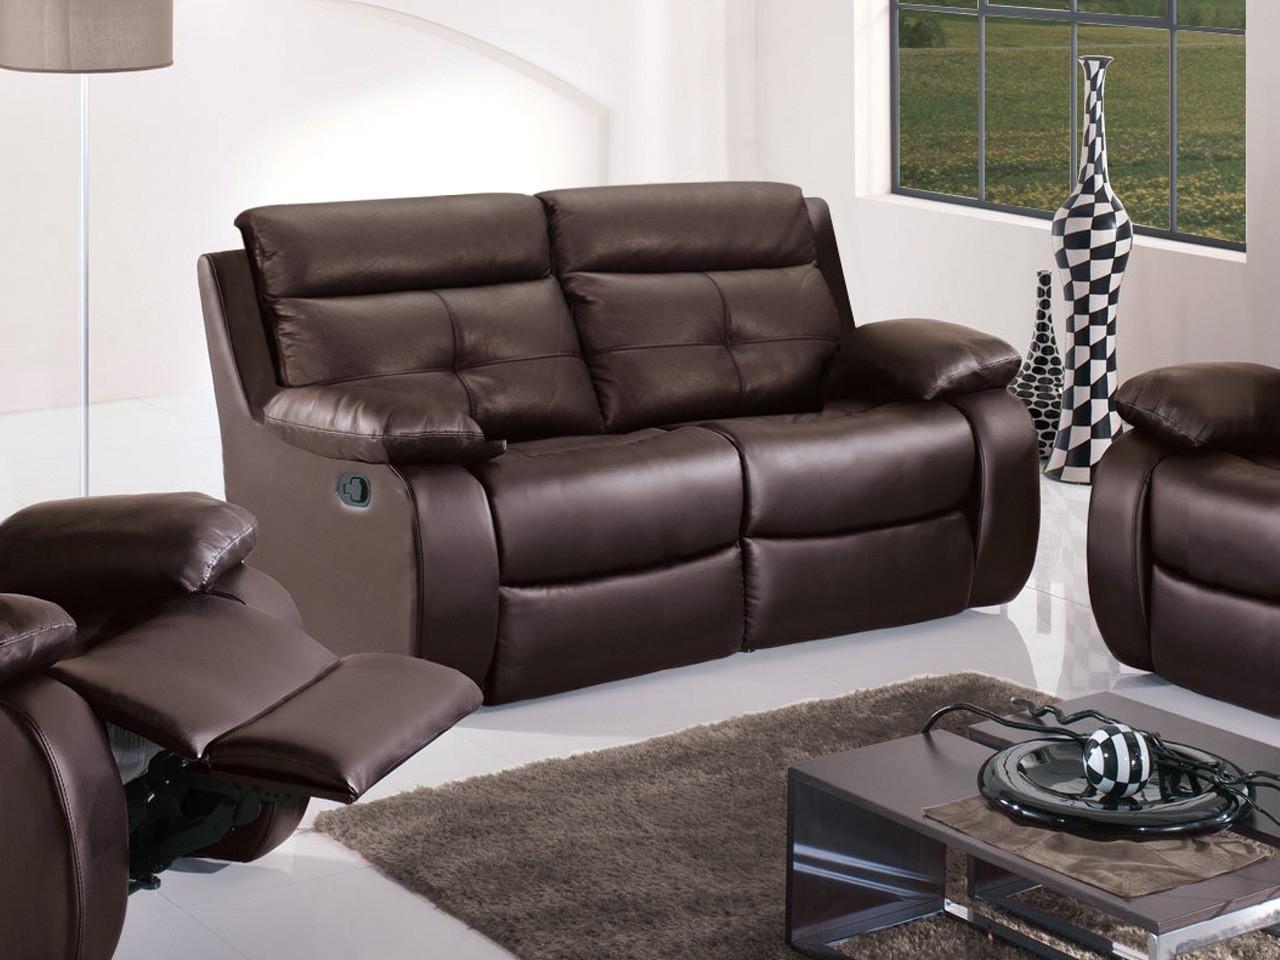 Dicoro sofas Kvdd Affascinante sofas Reclinables Baratos Y Relax Dicoro